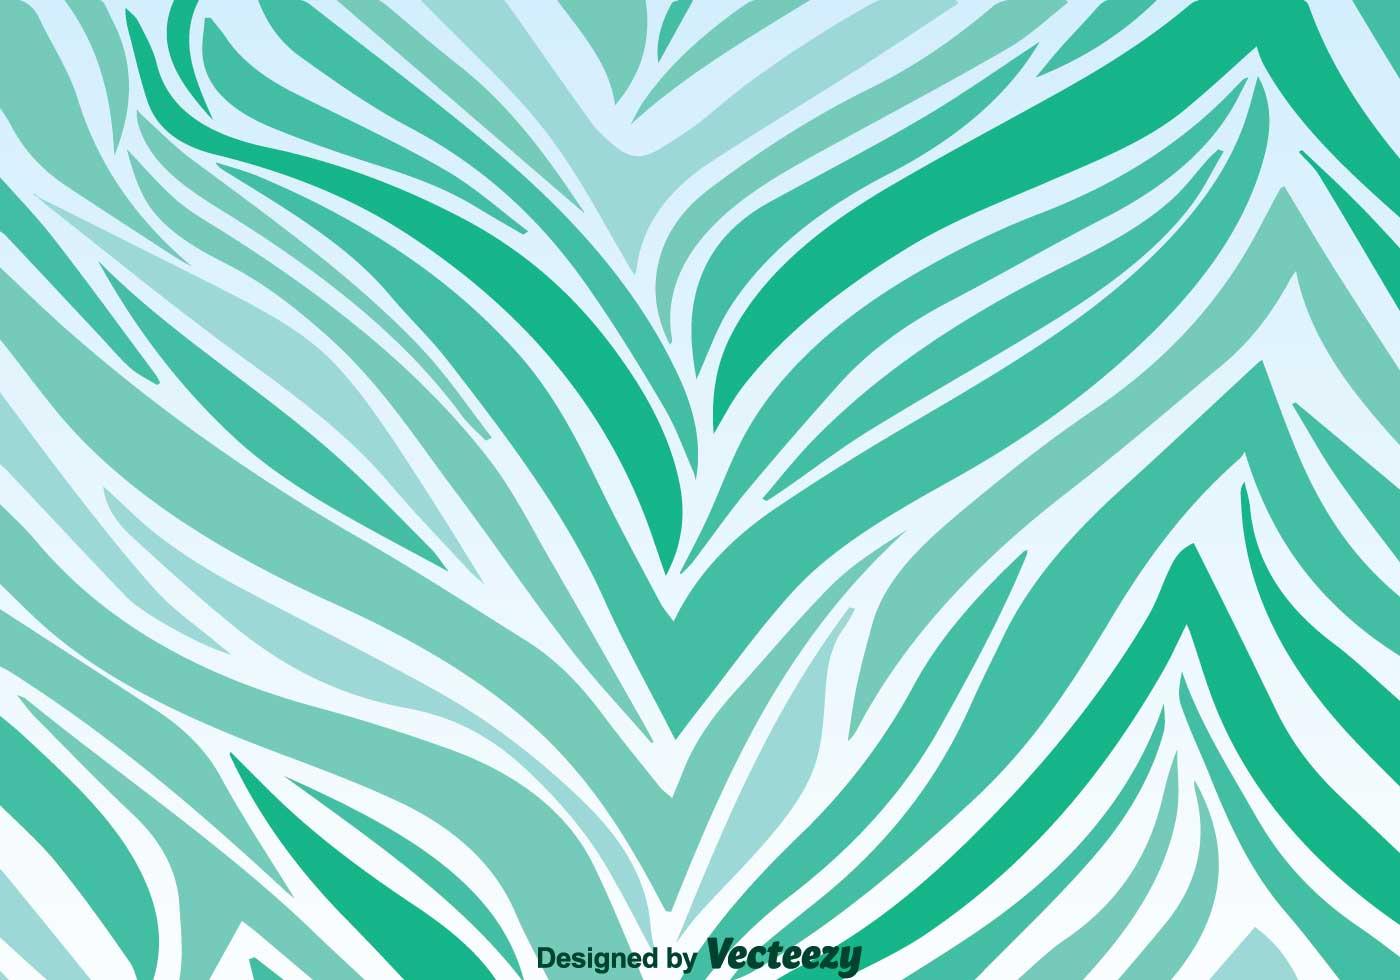 soft zebra print background download free vector art leopard print vector free leopard print vector illustrator